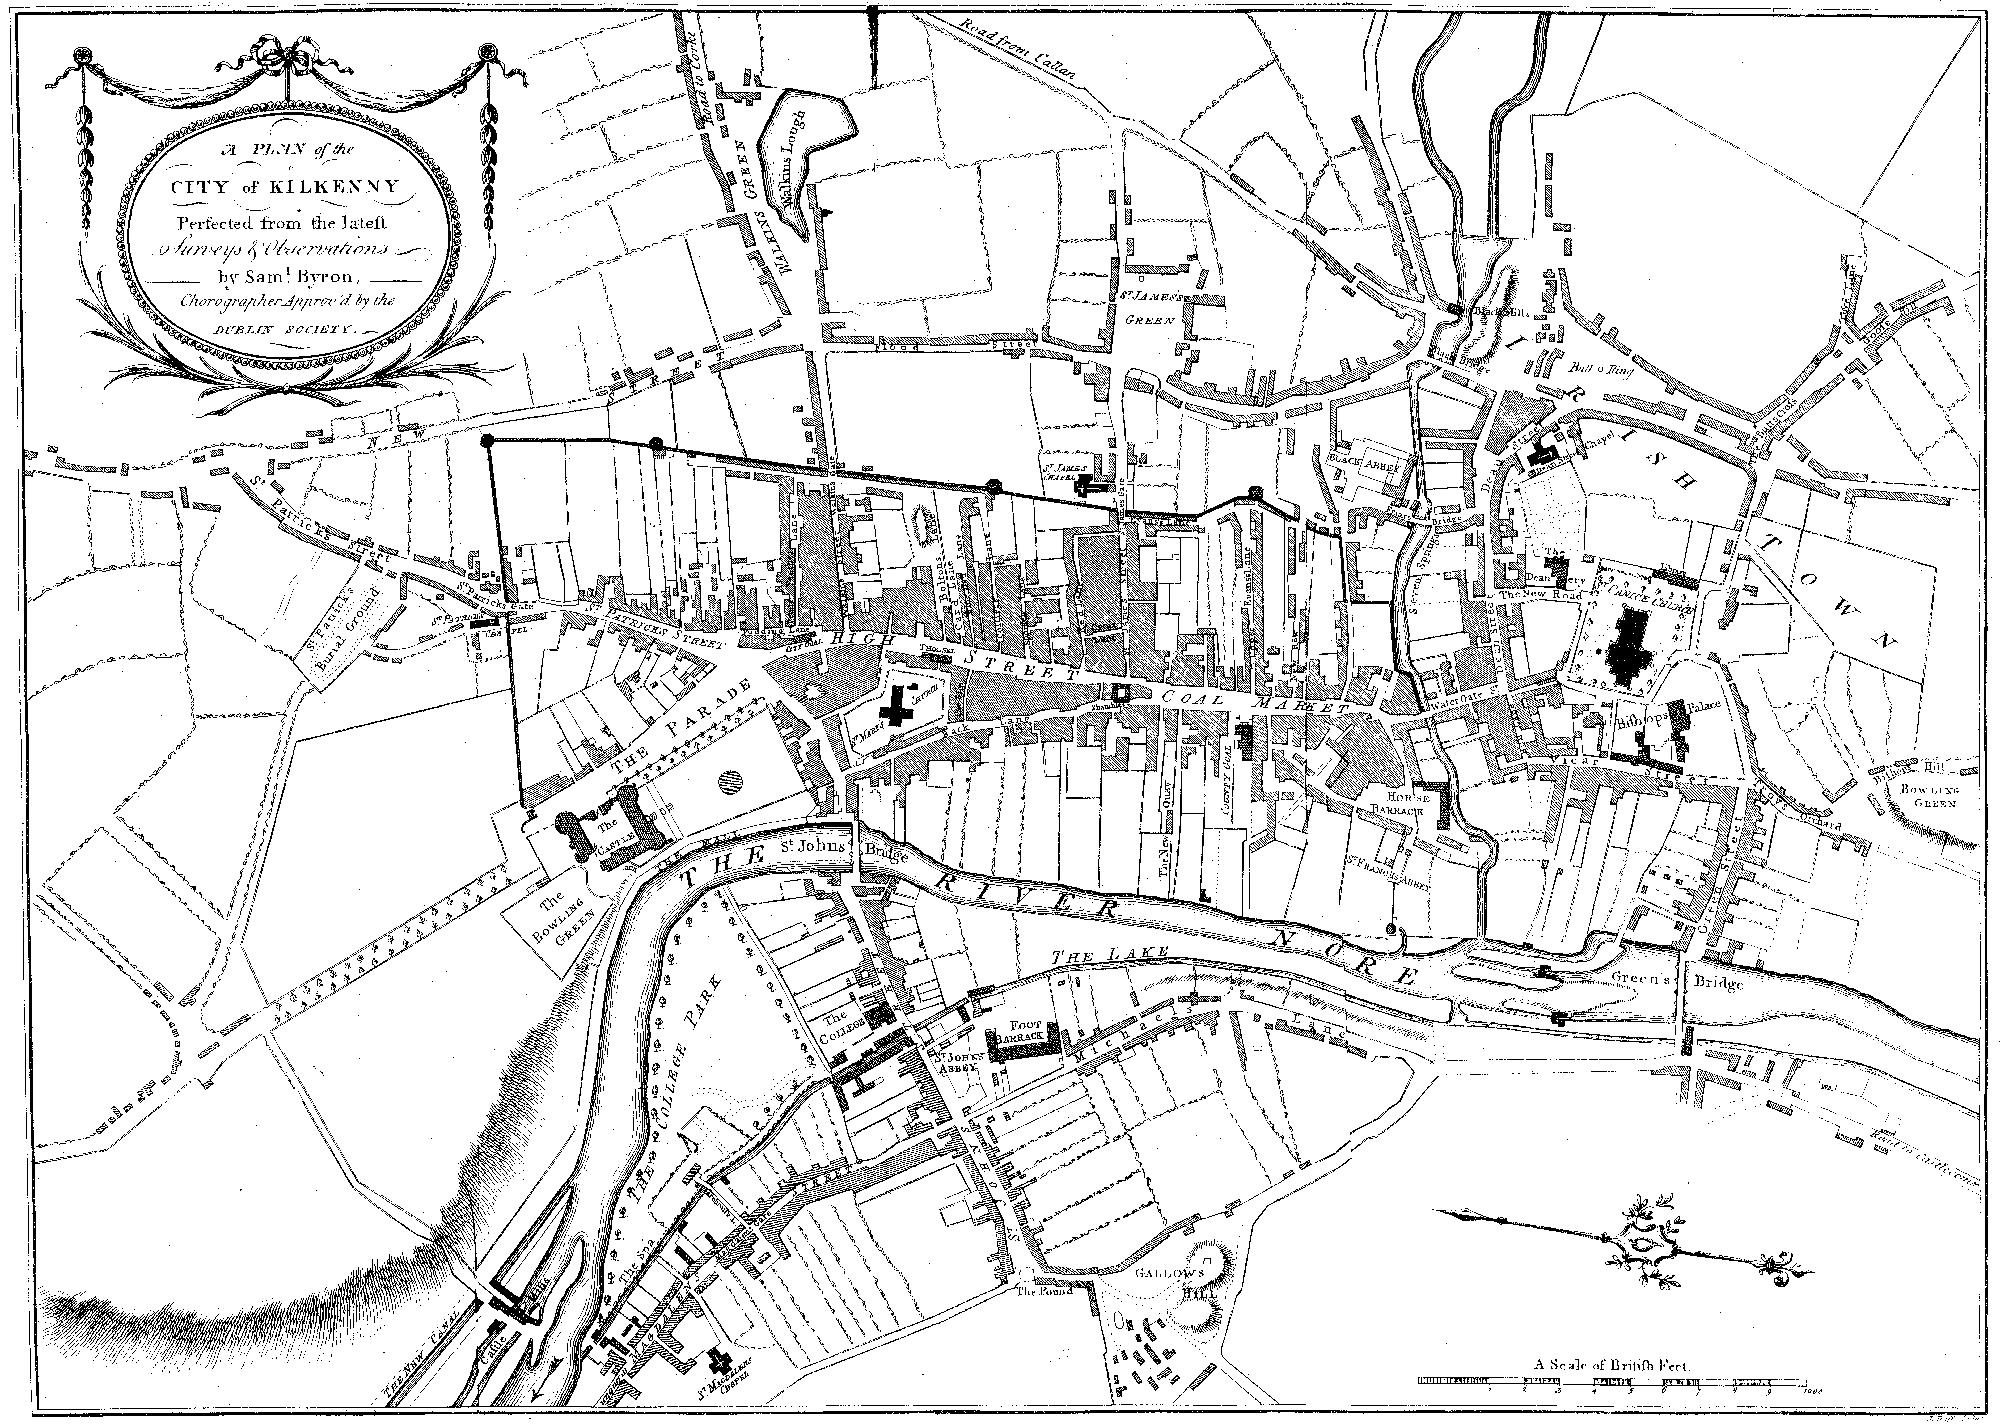 Map Of Ireland Showing Kilkenny.History Of Kilkenny Wikipedia